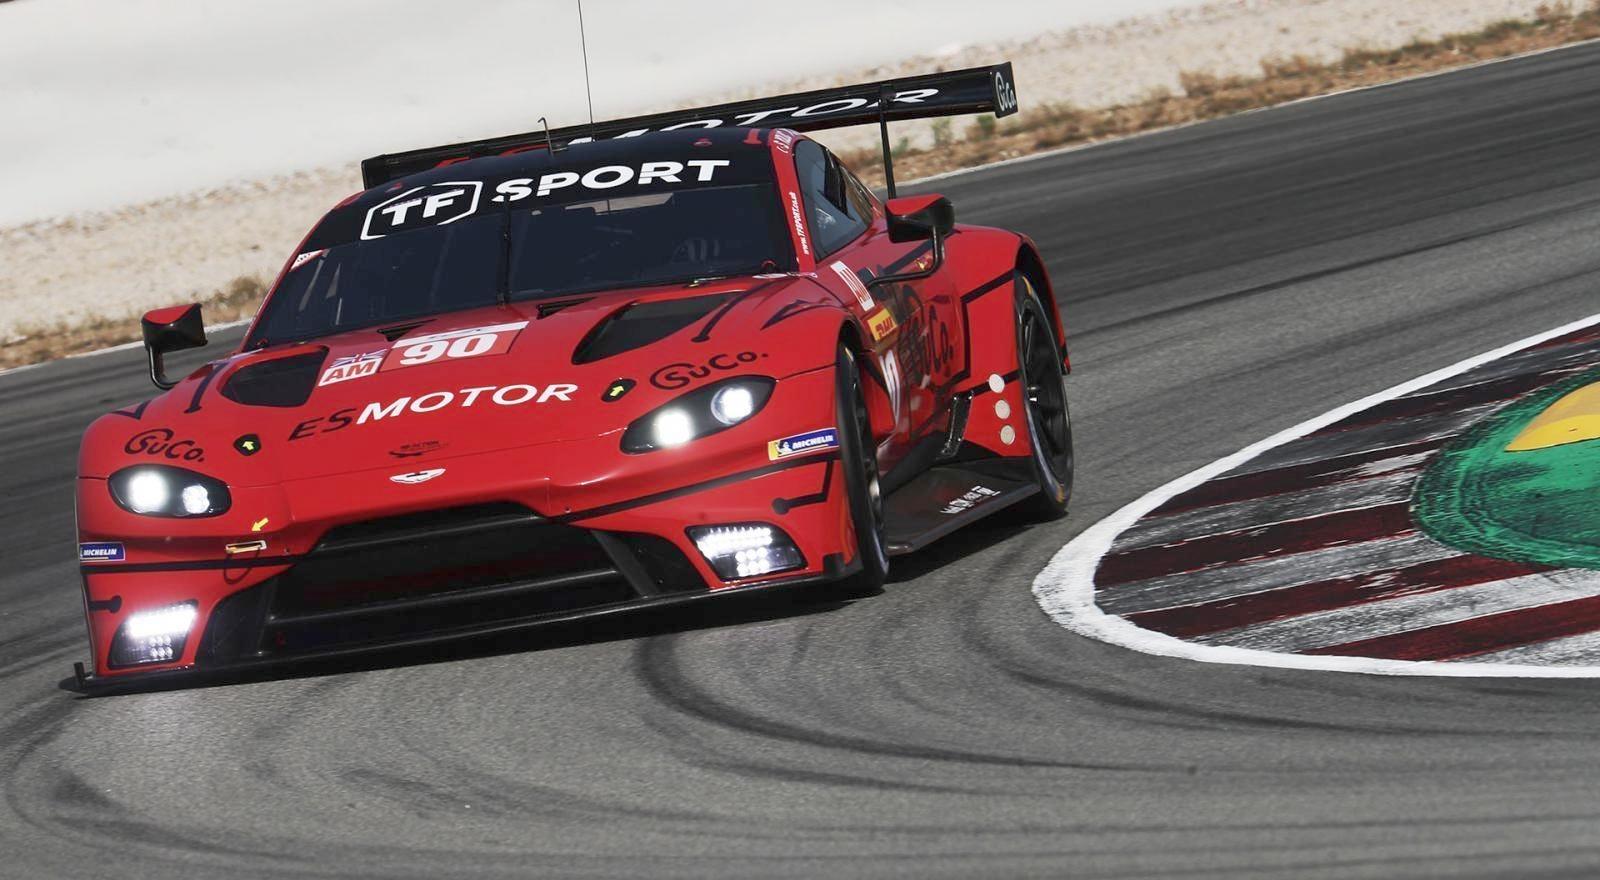 TF-SPORT-GTE-2019-on-track-4.jpg